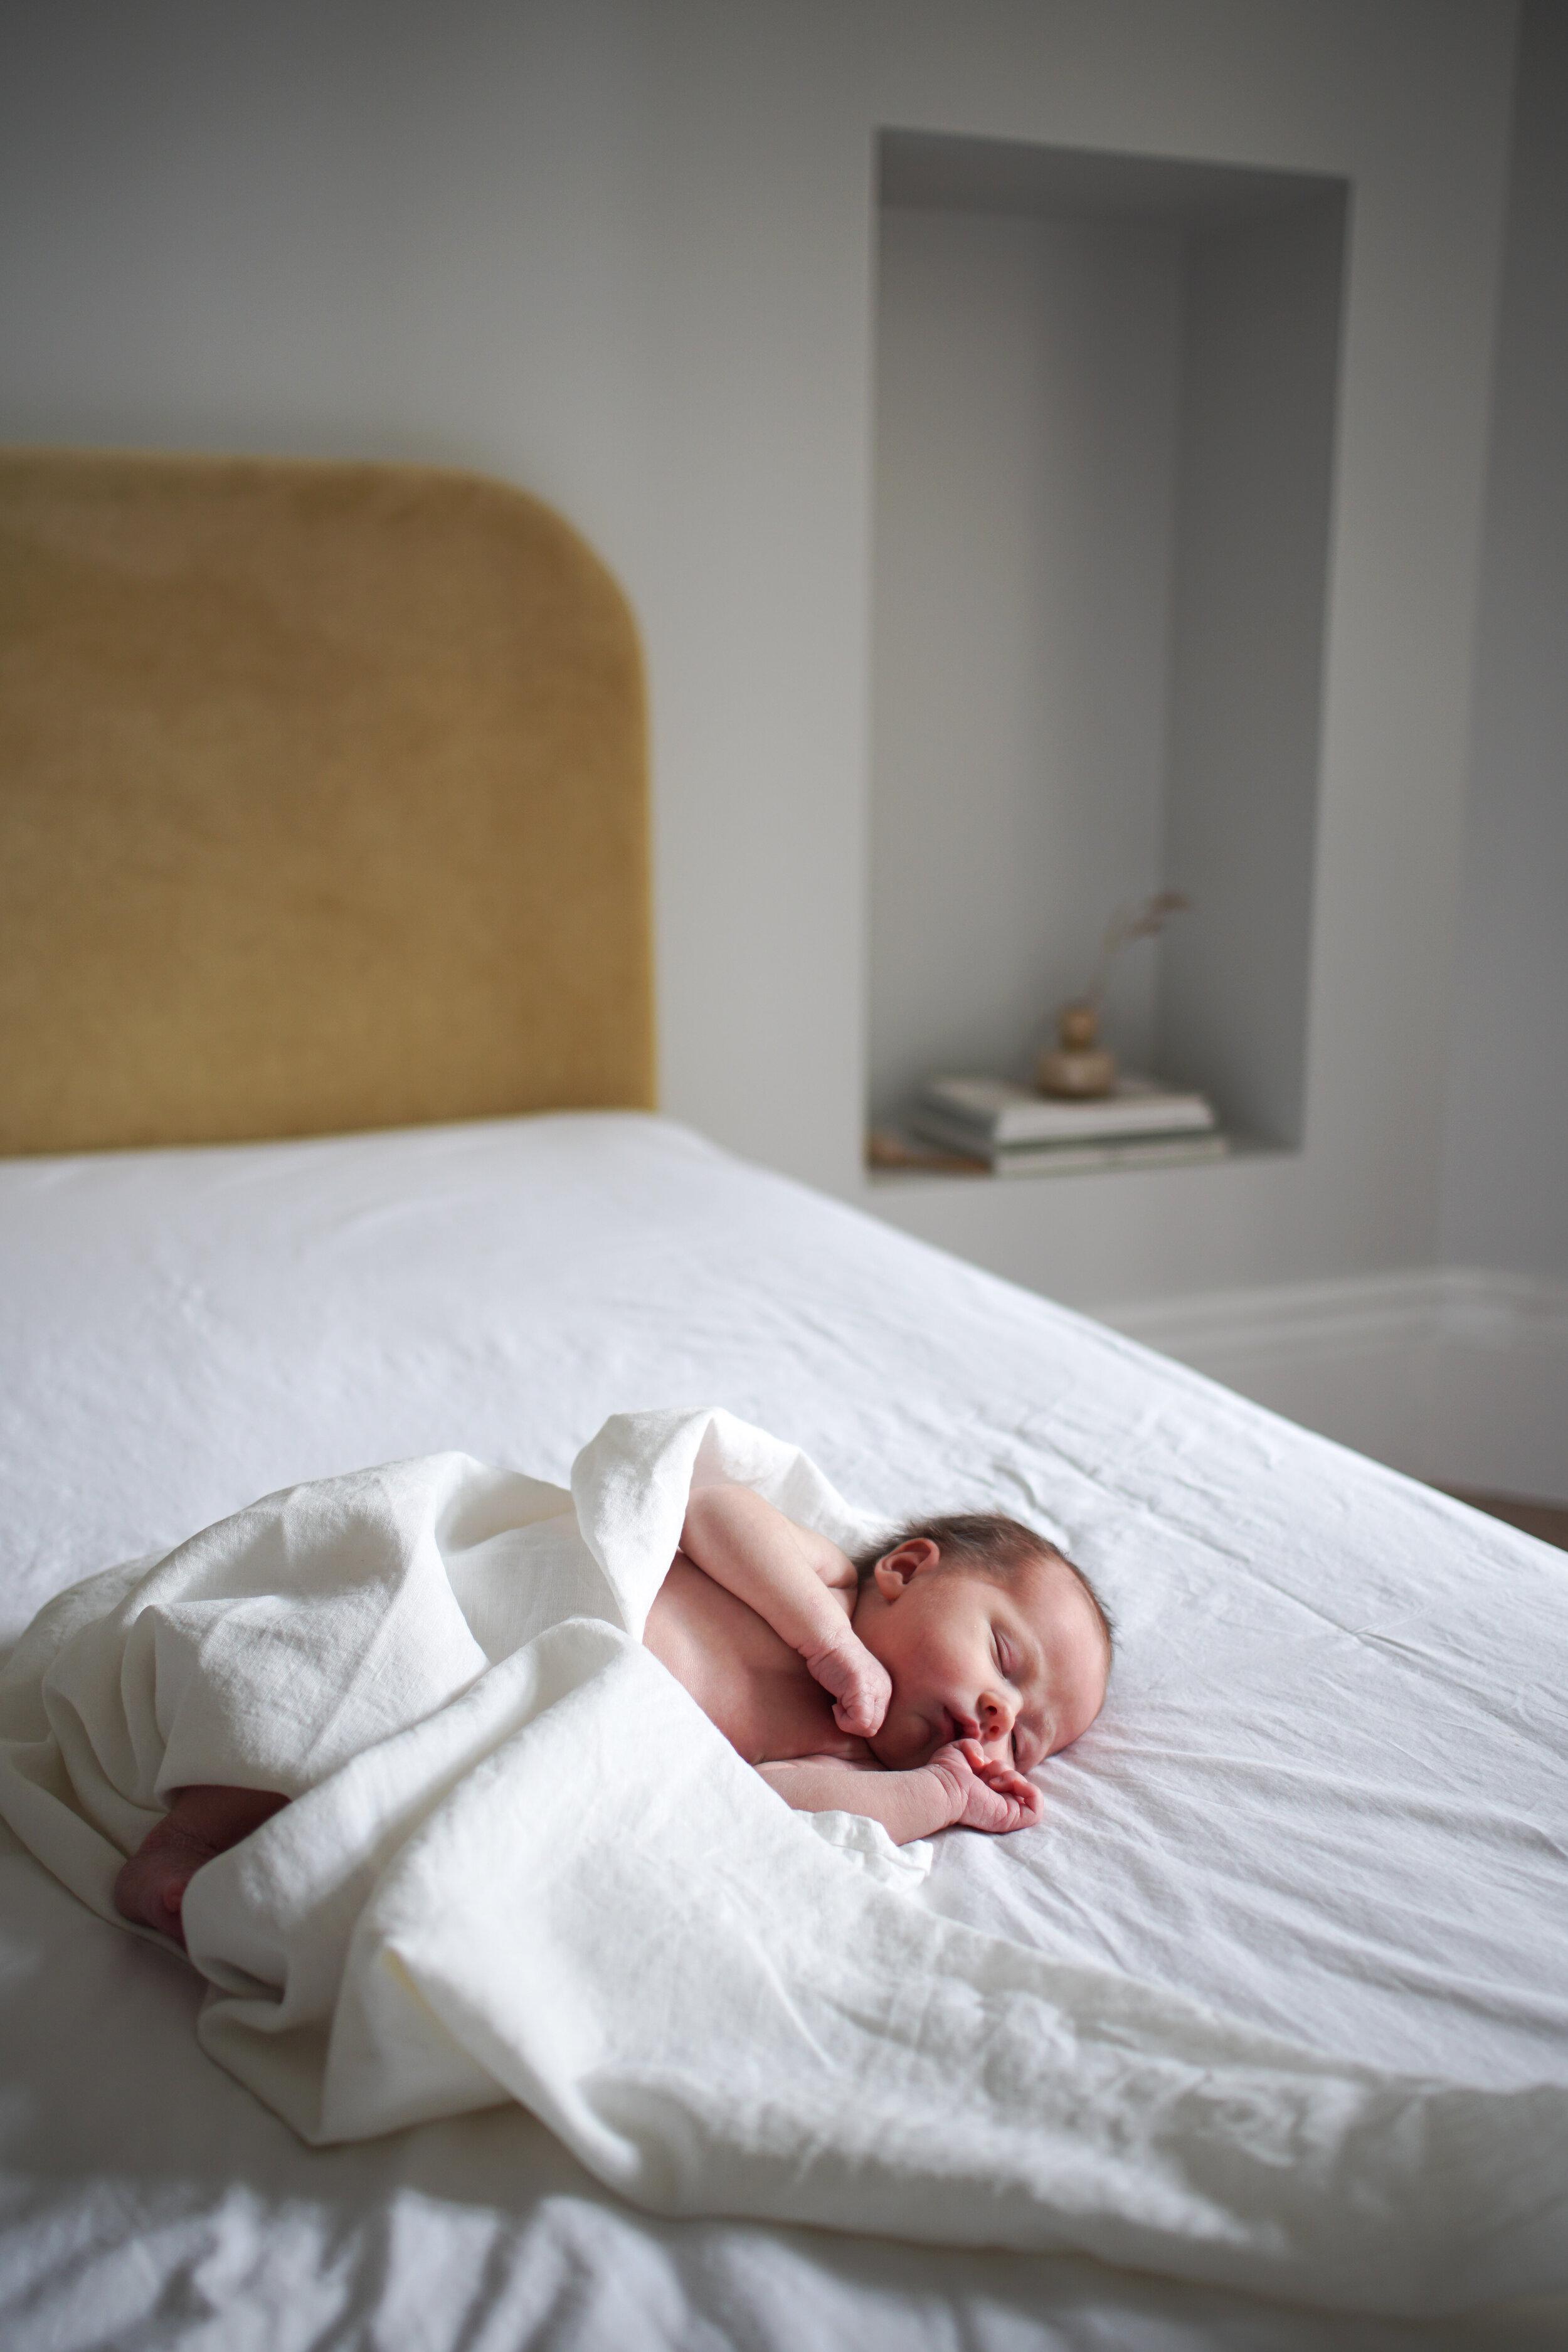 20190921-Coterie-Baby-6days-01503.jpg